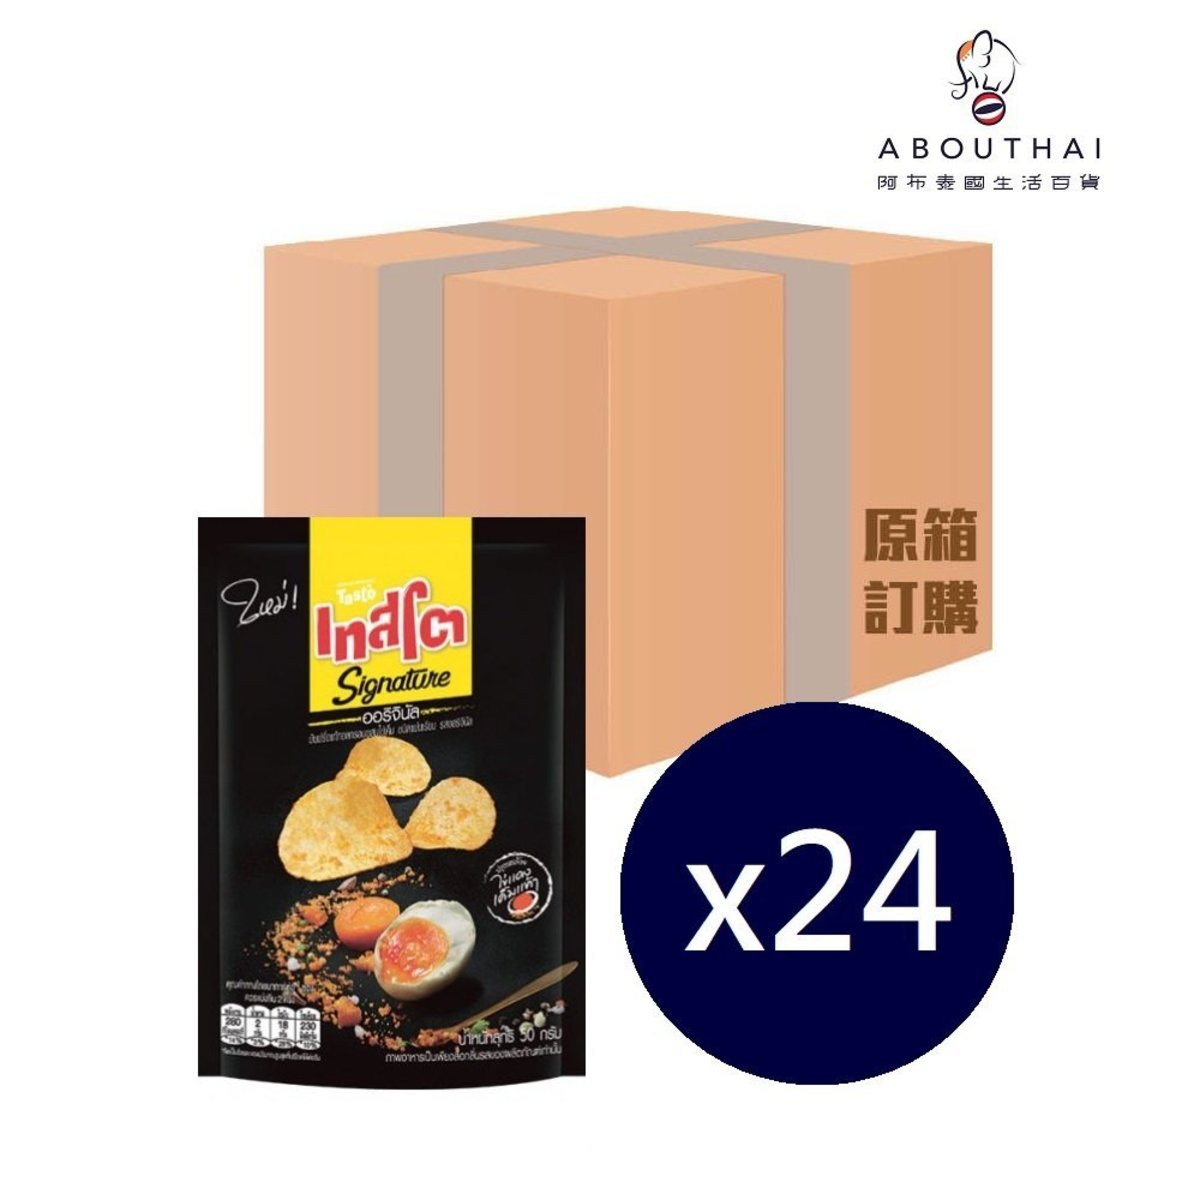 Potato chips with salted eggs 50g (Original Flavor) FULL CASE 24 packs